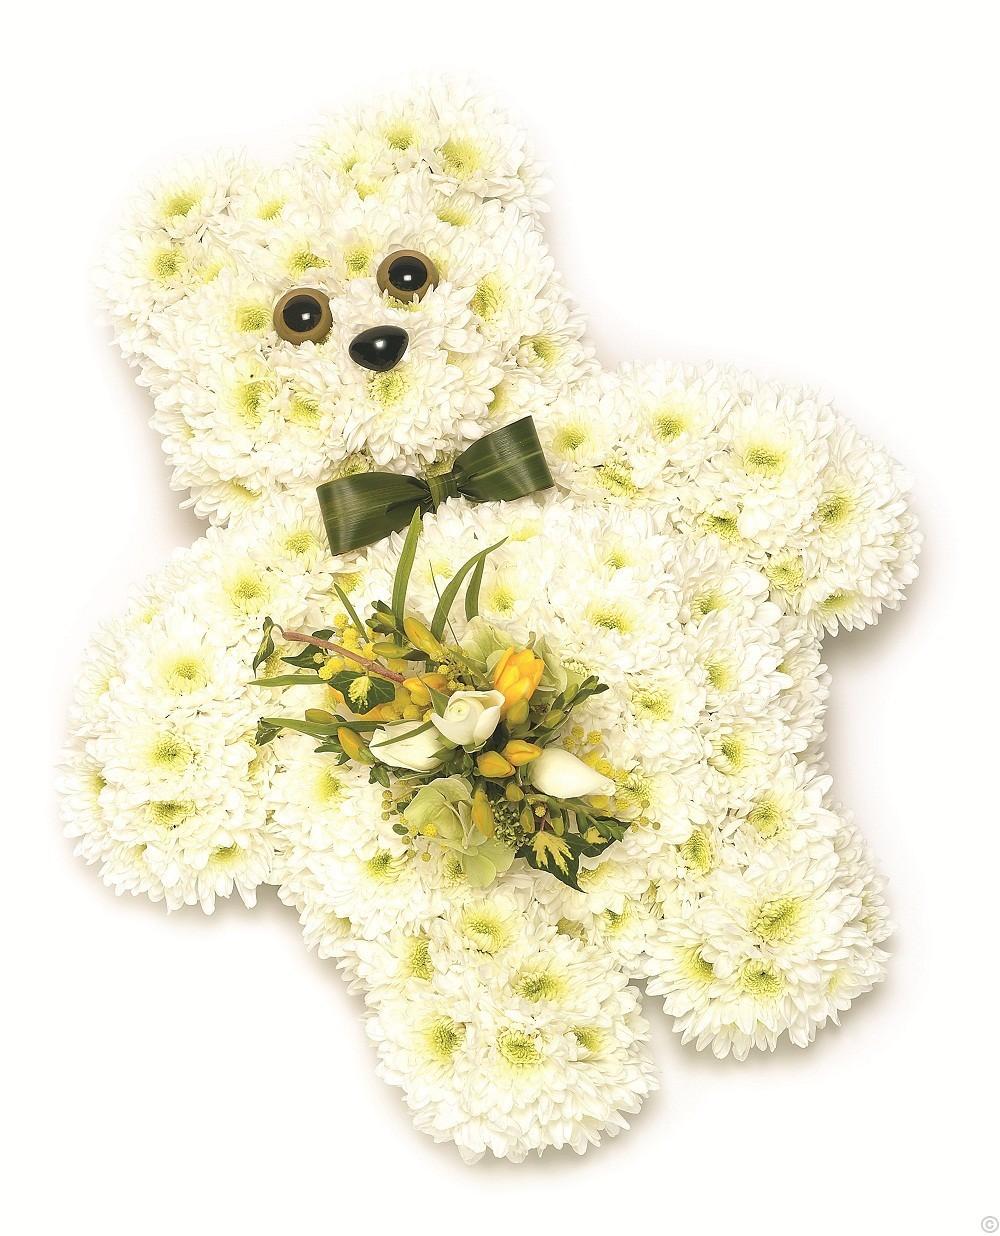 Funeral arrangements special tributes free delivery dublin ireland teddy bear funeral arrangement izmirmasajfo